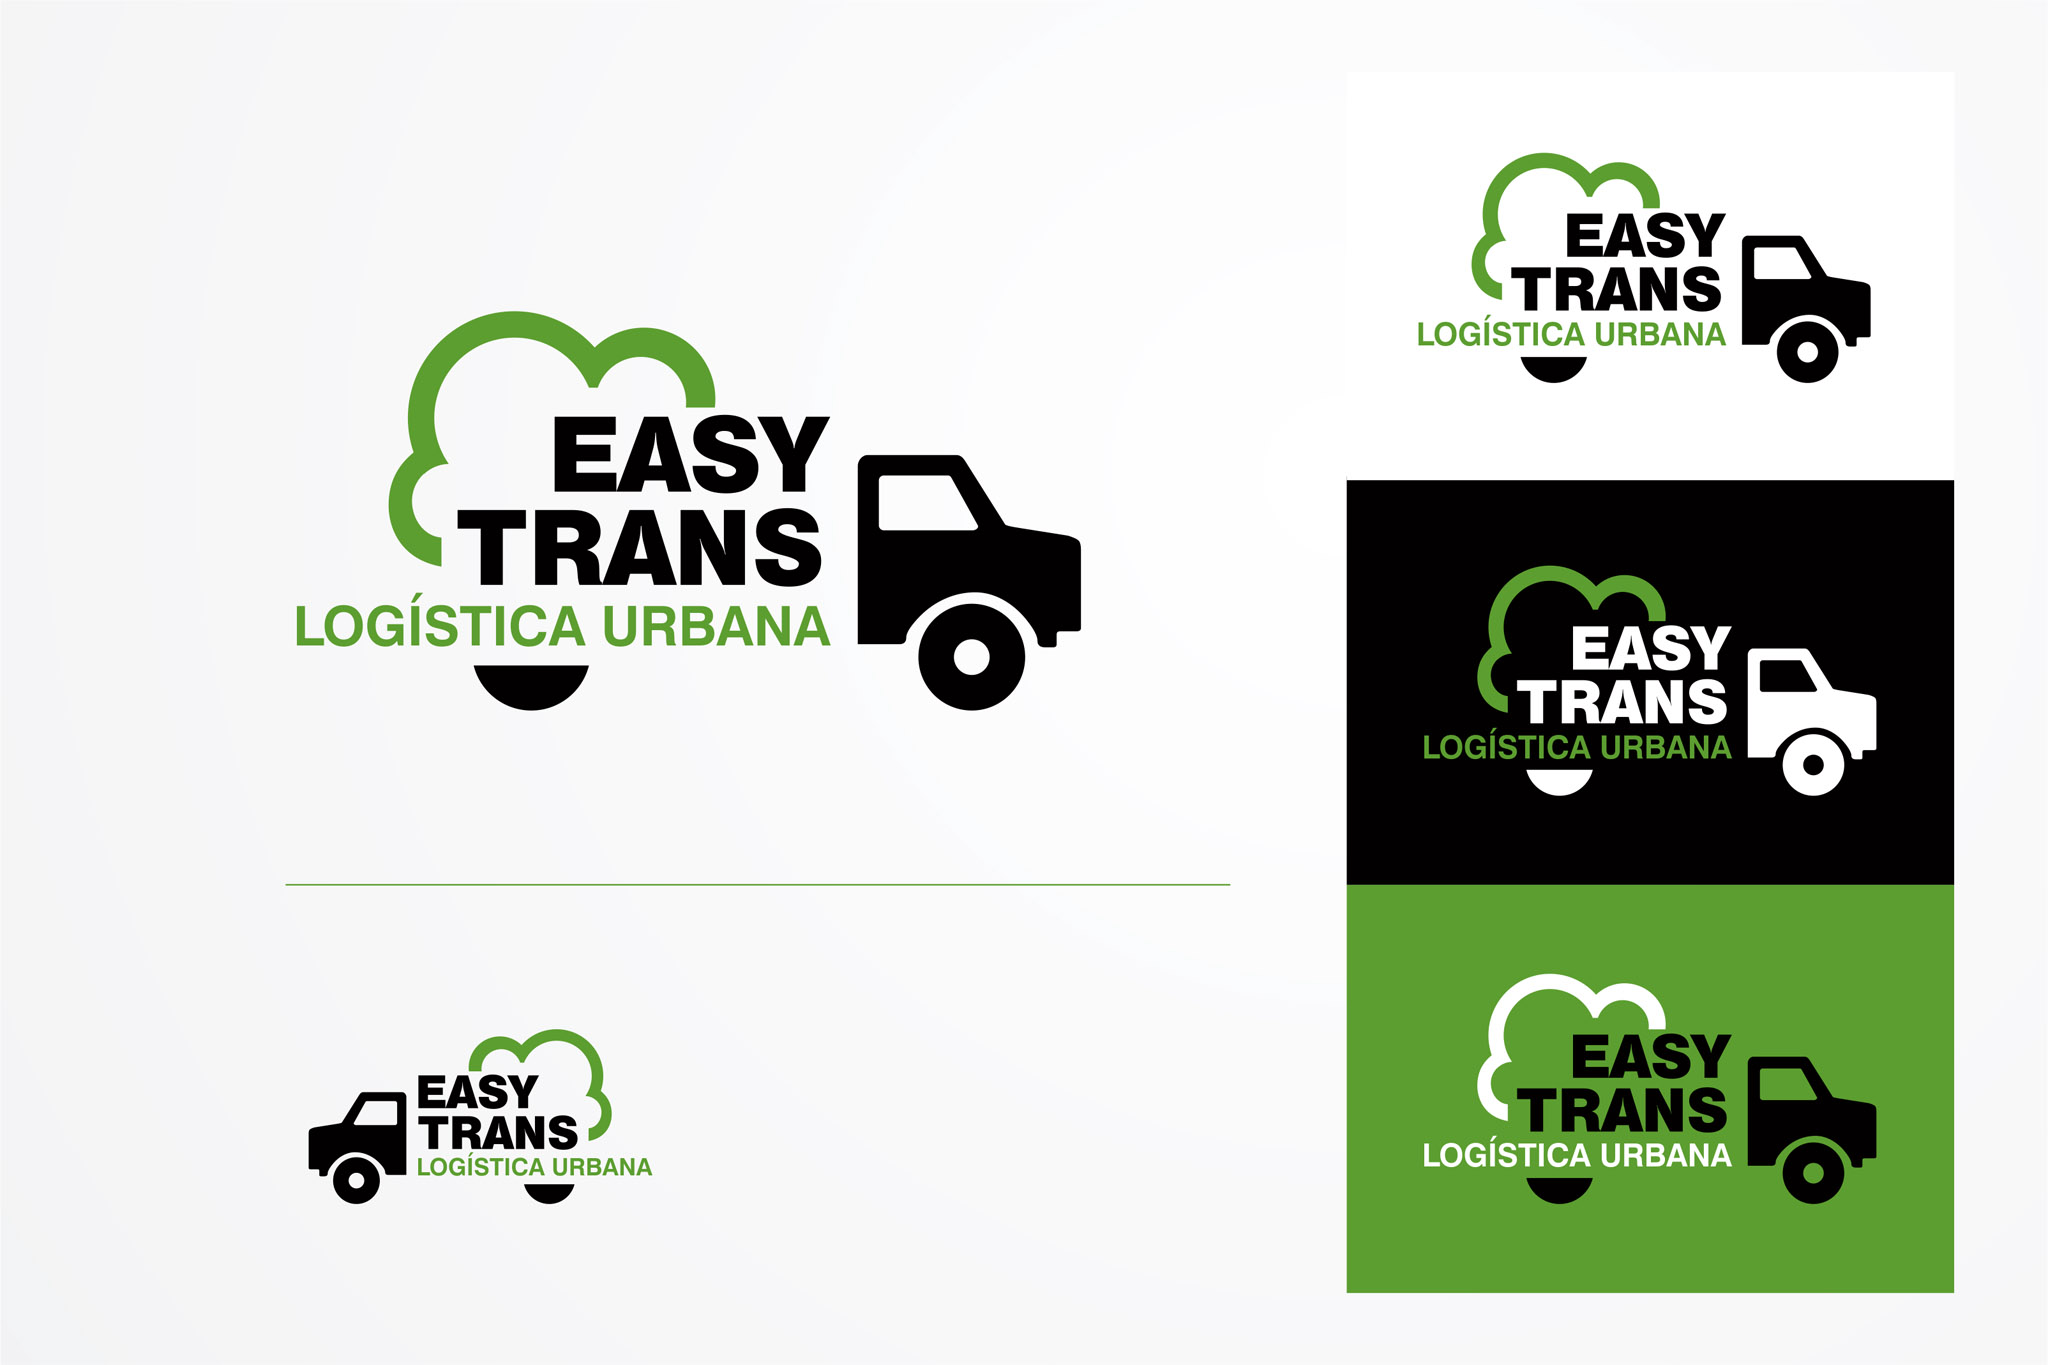 Easy Trans Logística Urbana